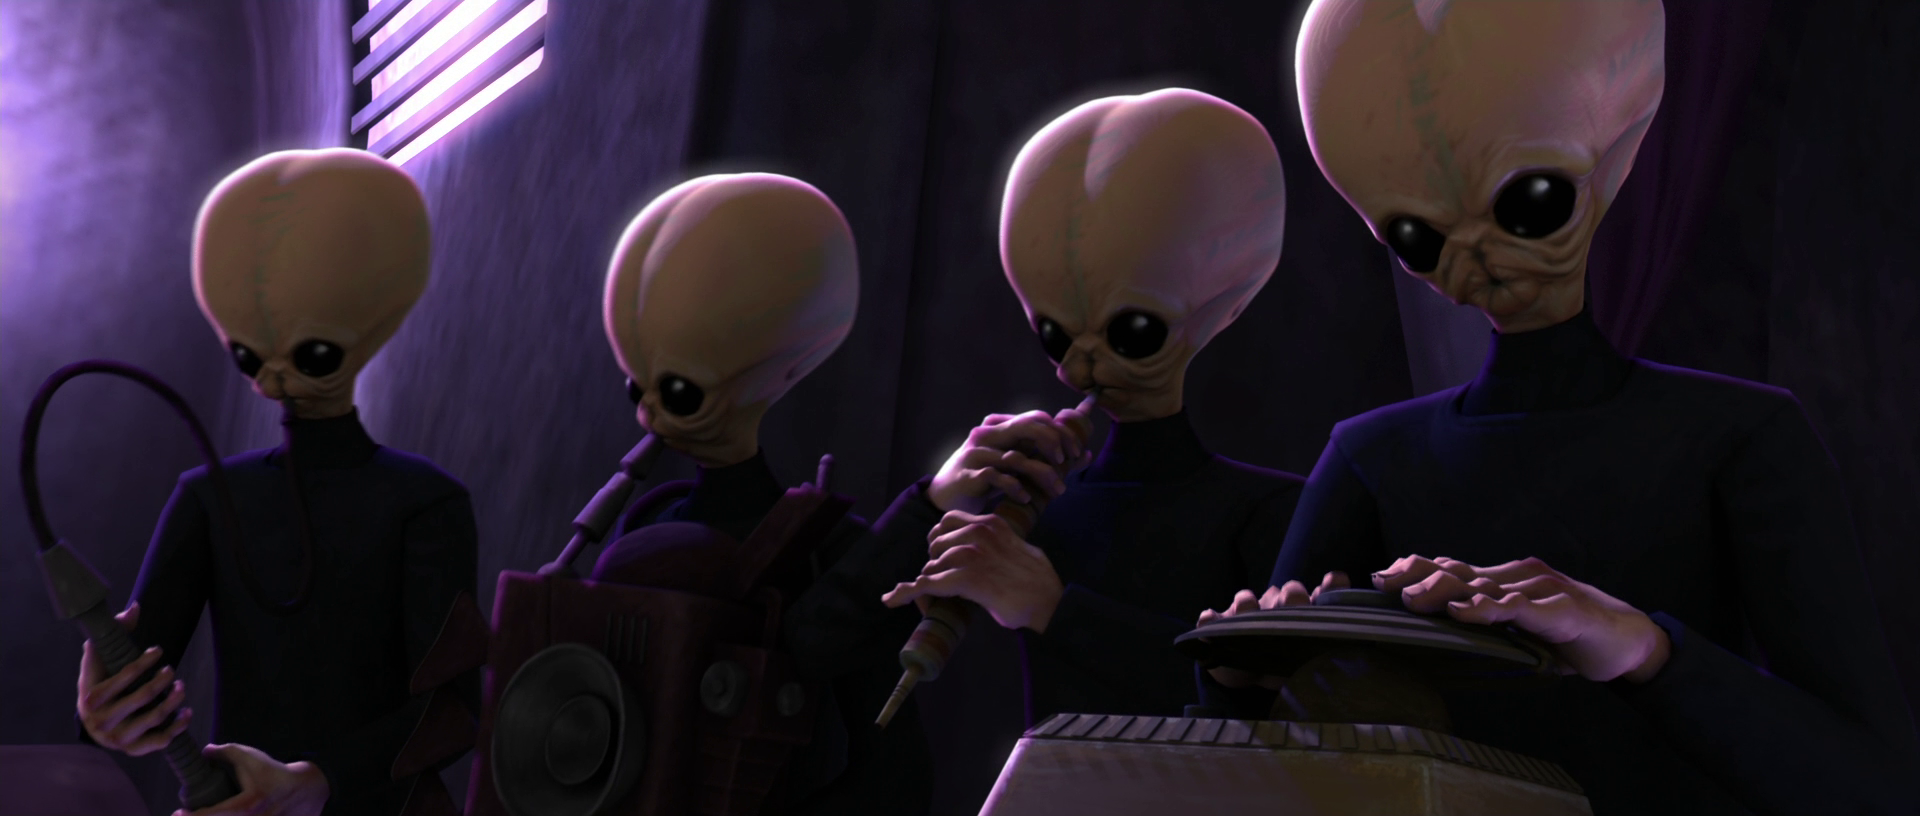 Alieno non troppo – Bogi's Radio Play